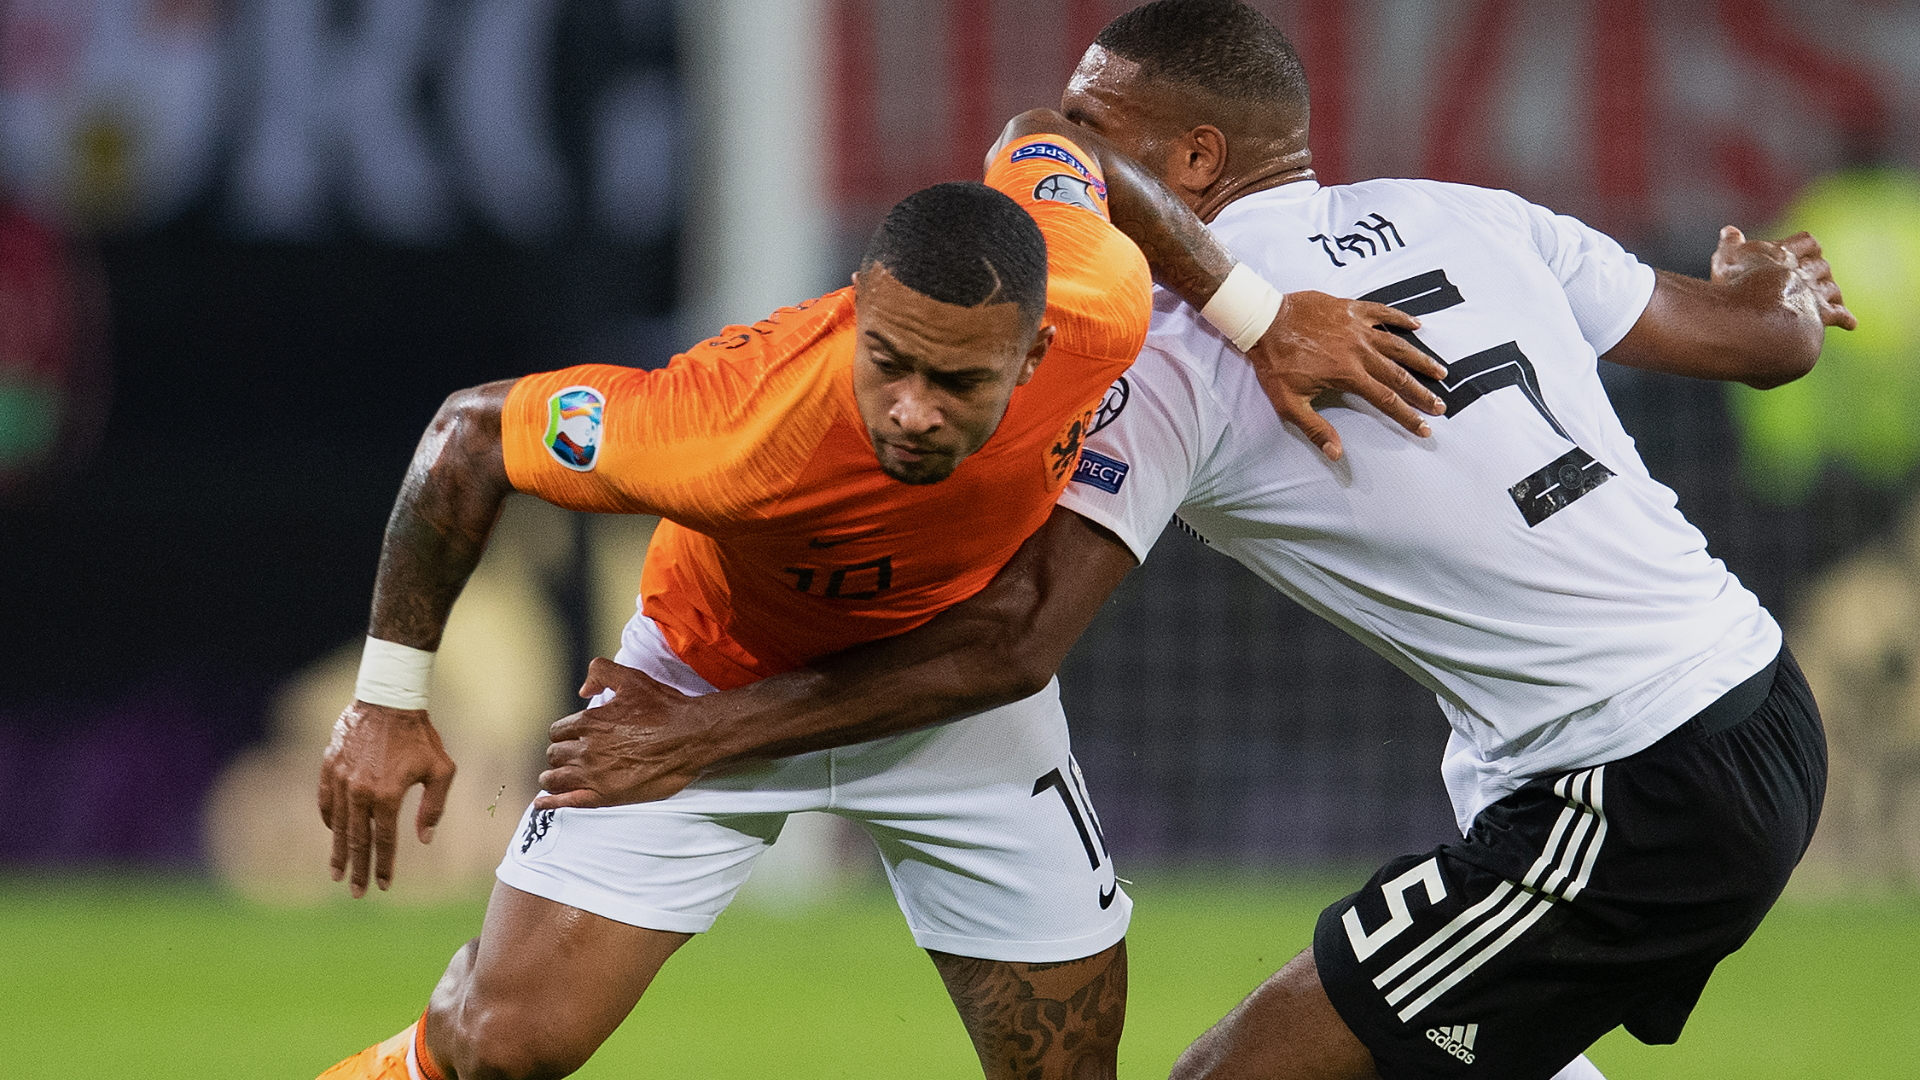 Memphis sets multiple Netherlands assists records after Estonia win